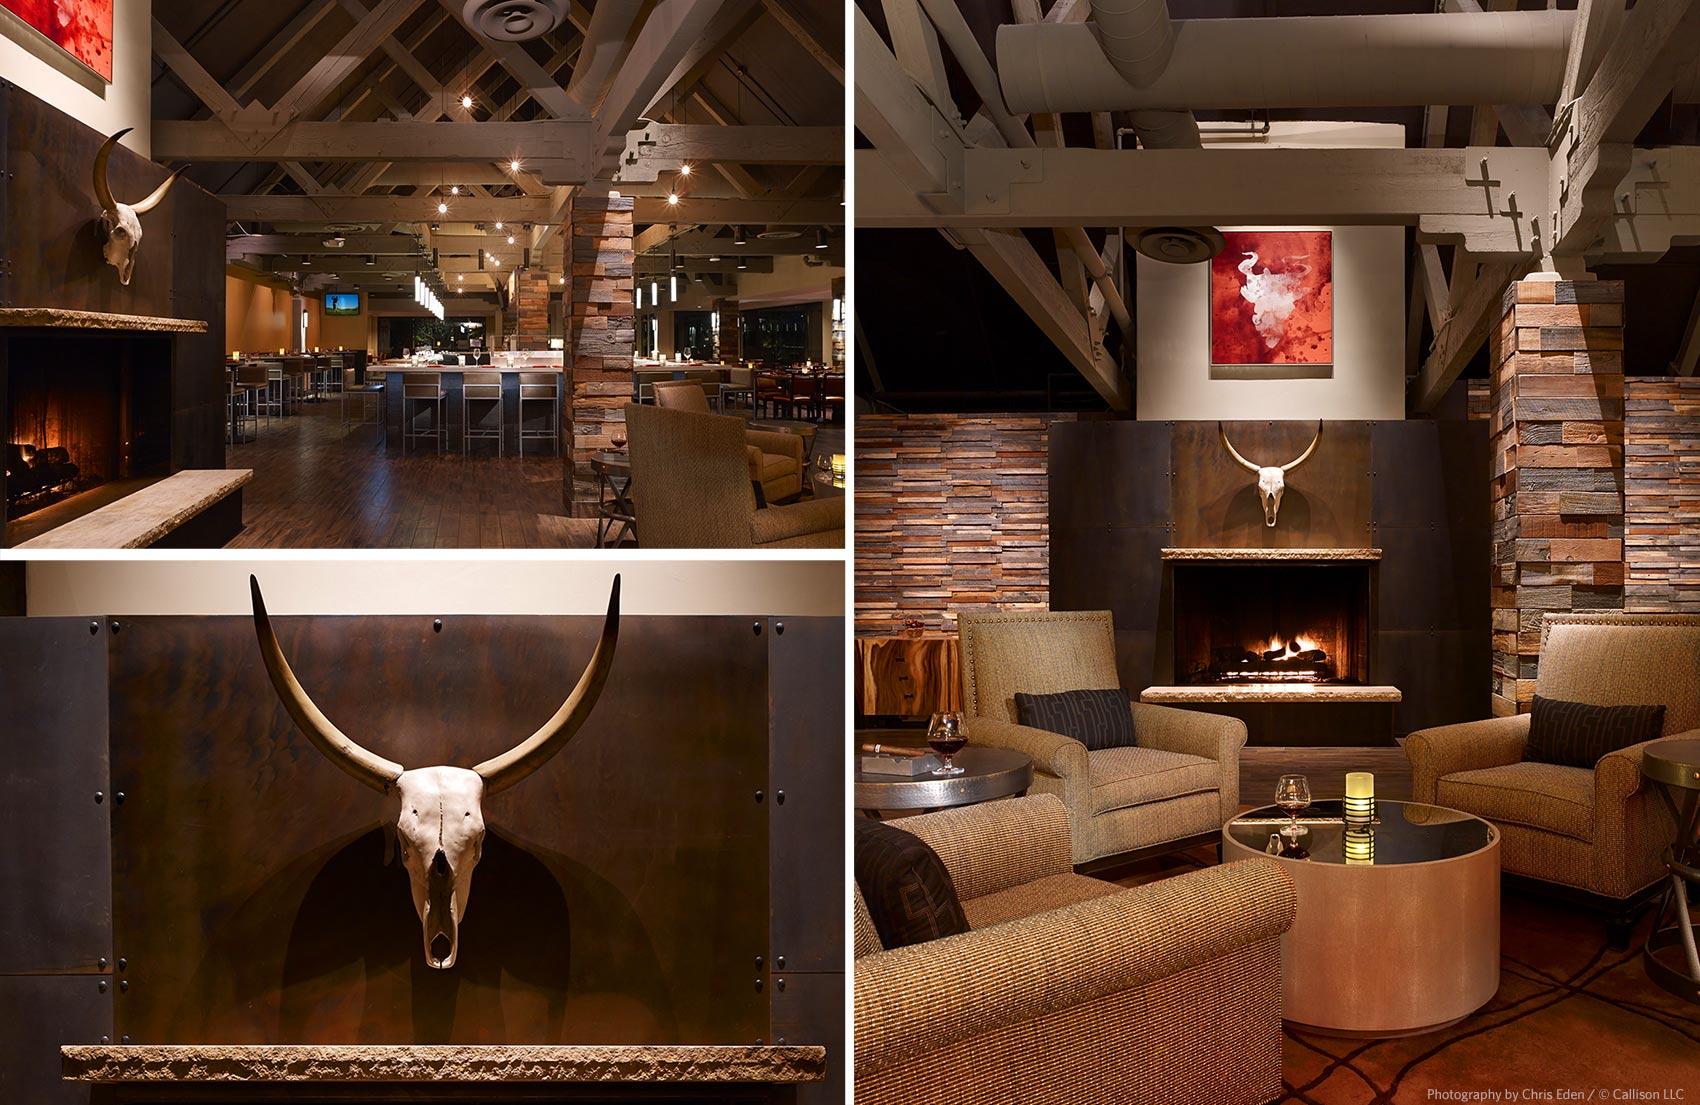 Toro Restaurant, Scottsdale - Restaurant interiors - details